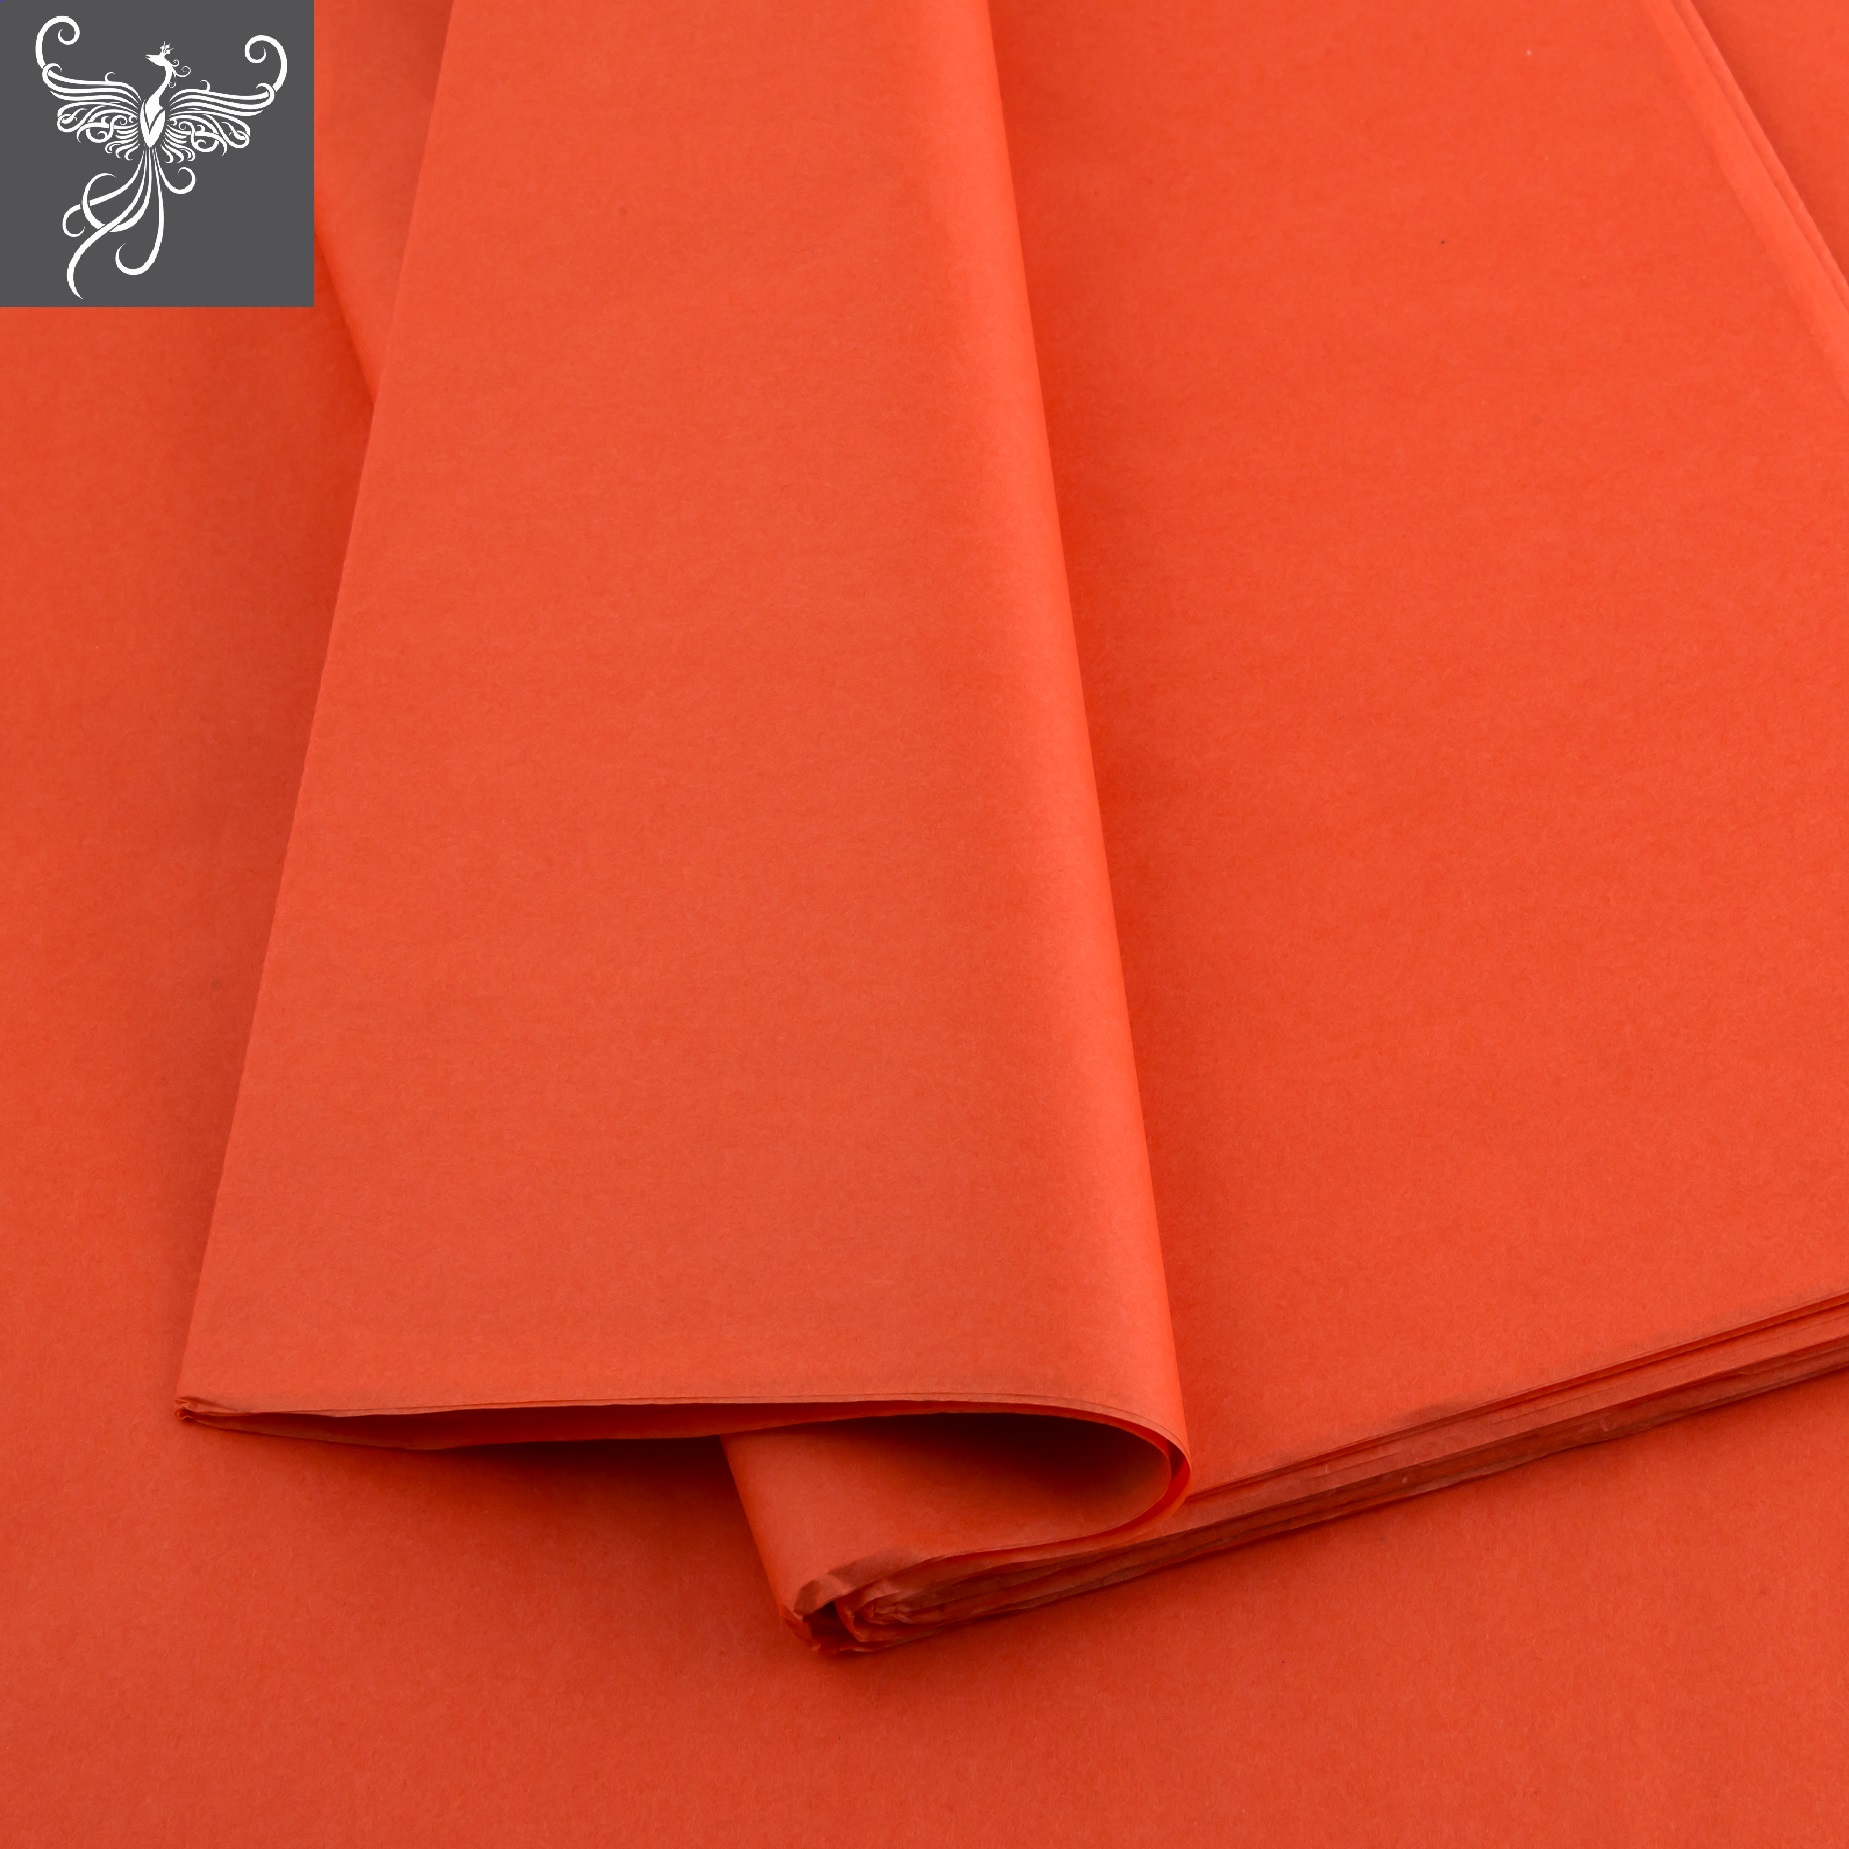 Silk paper orange